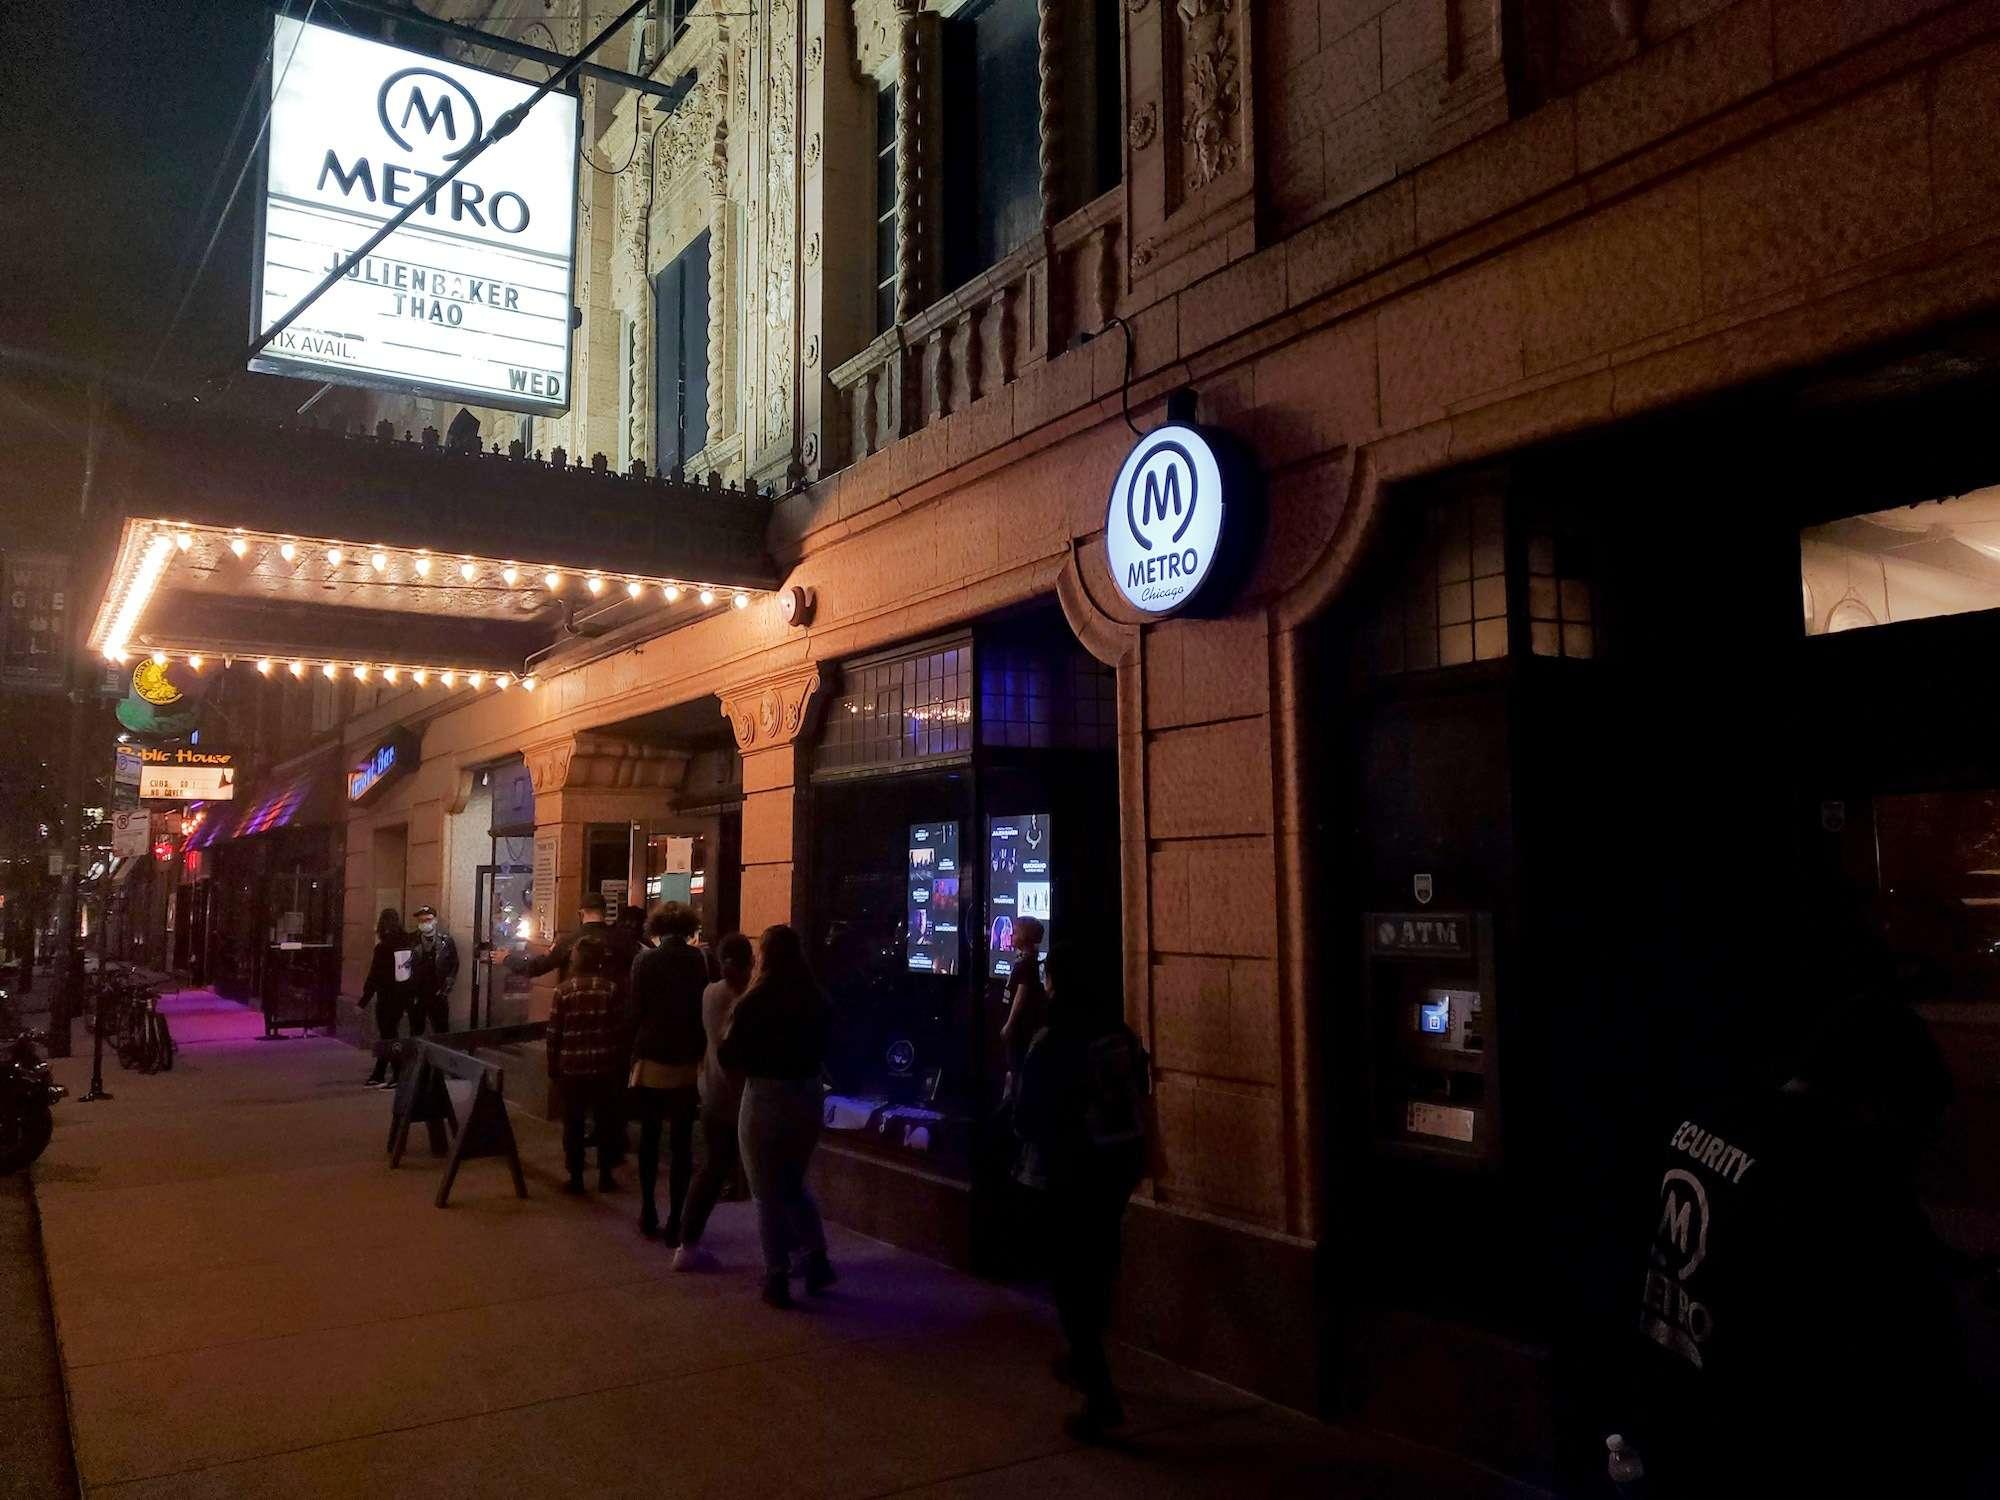 Julien Baker Live at Metro [GALLERY] 7